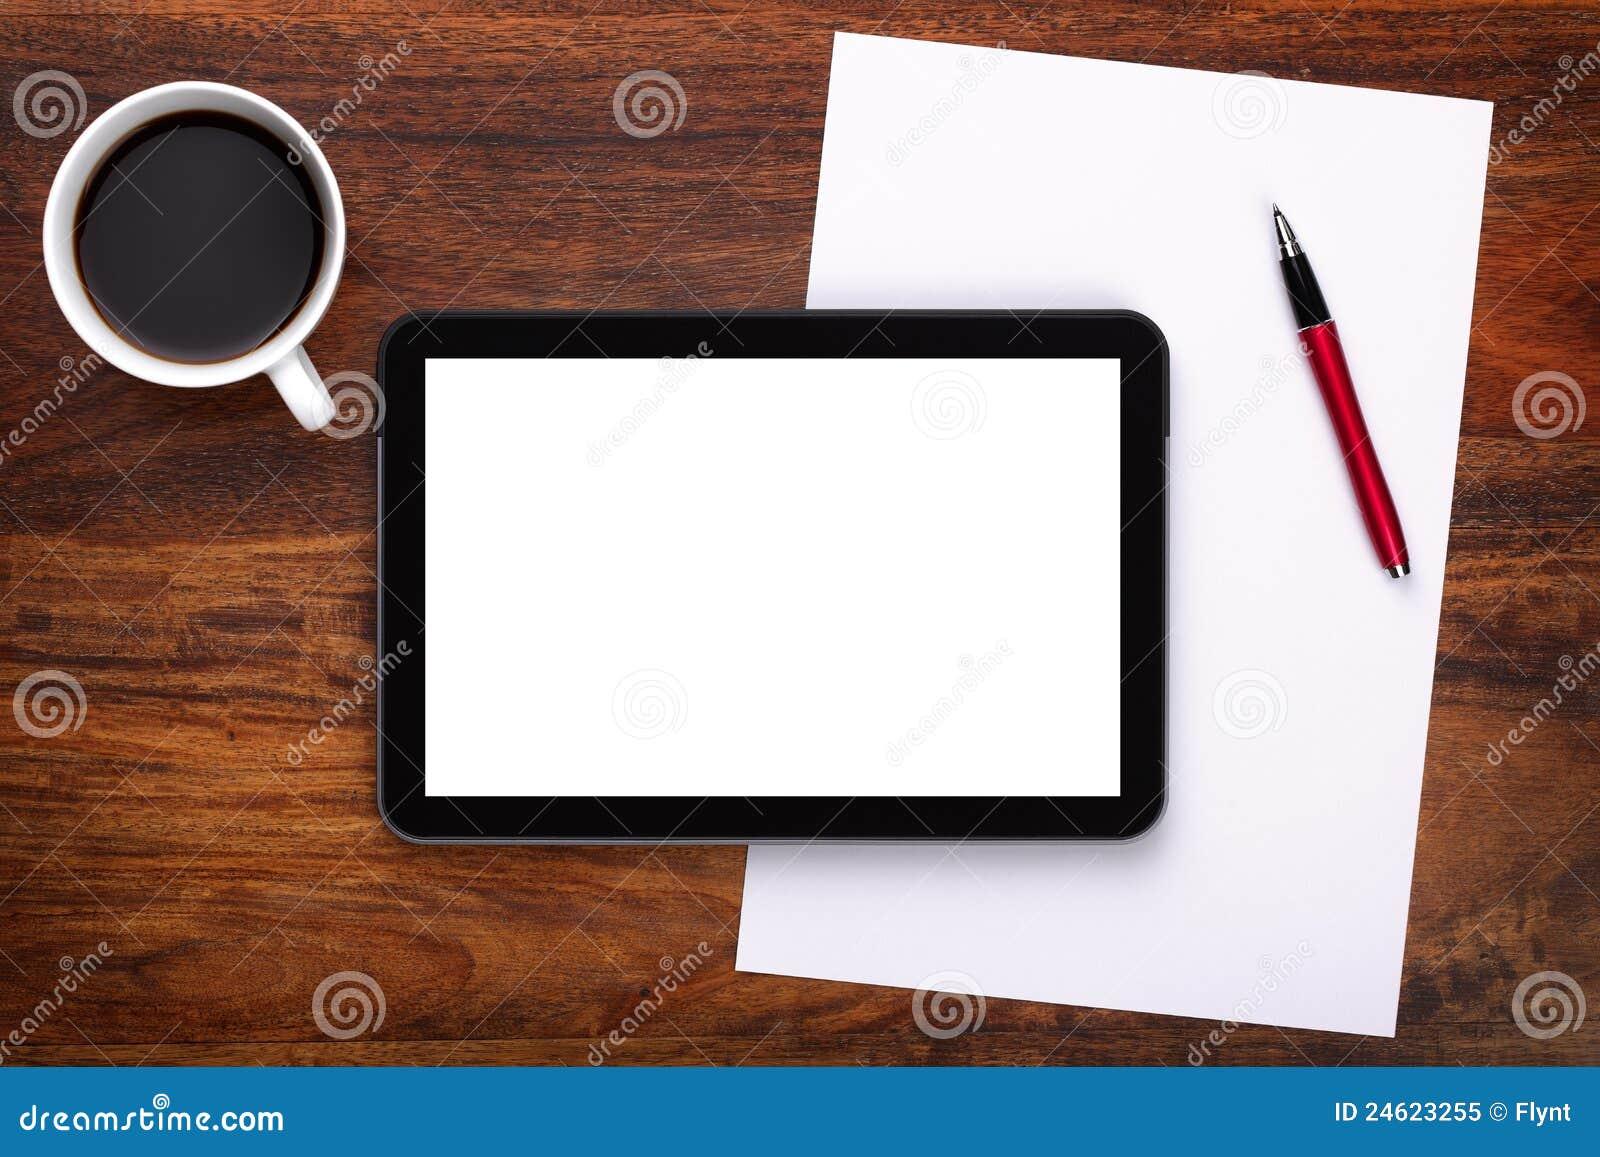 Blank Digital Tablet On Desk Royalty Free Stock Photo